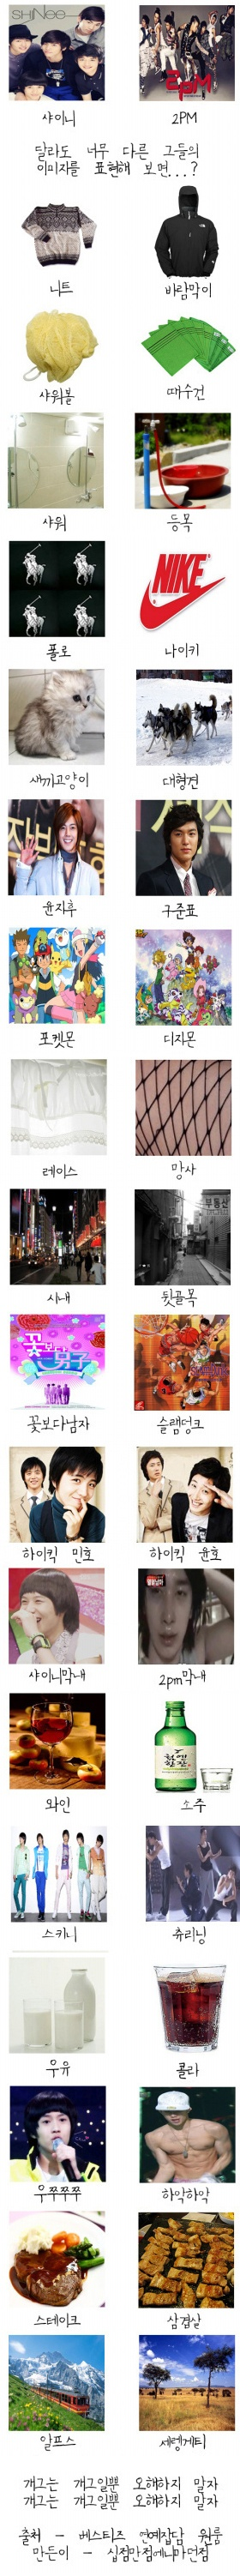 2pm_Shinee_110609_2